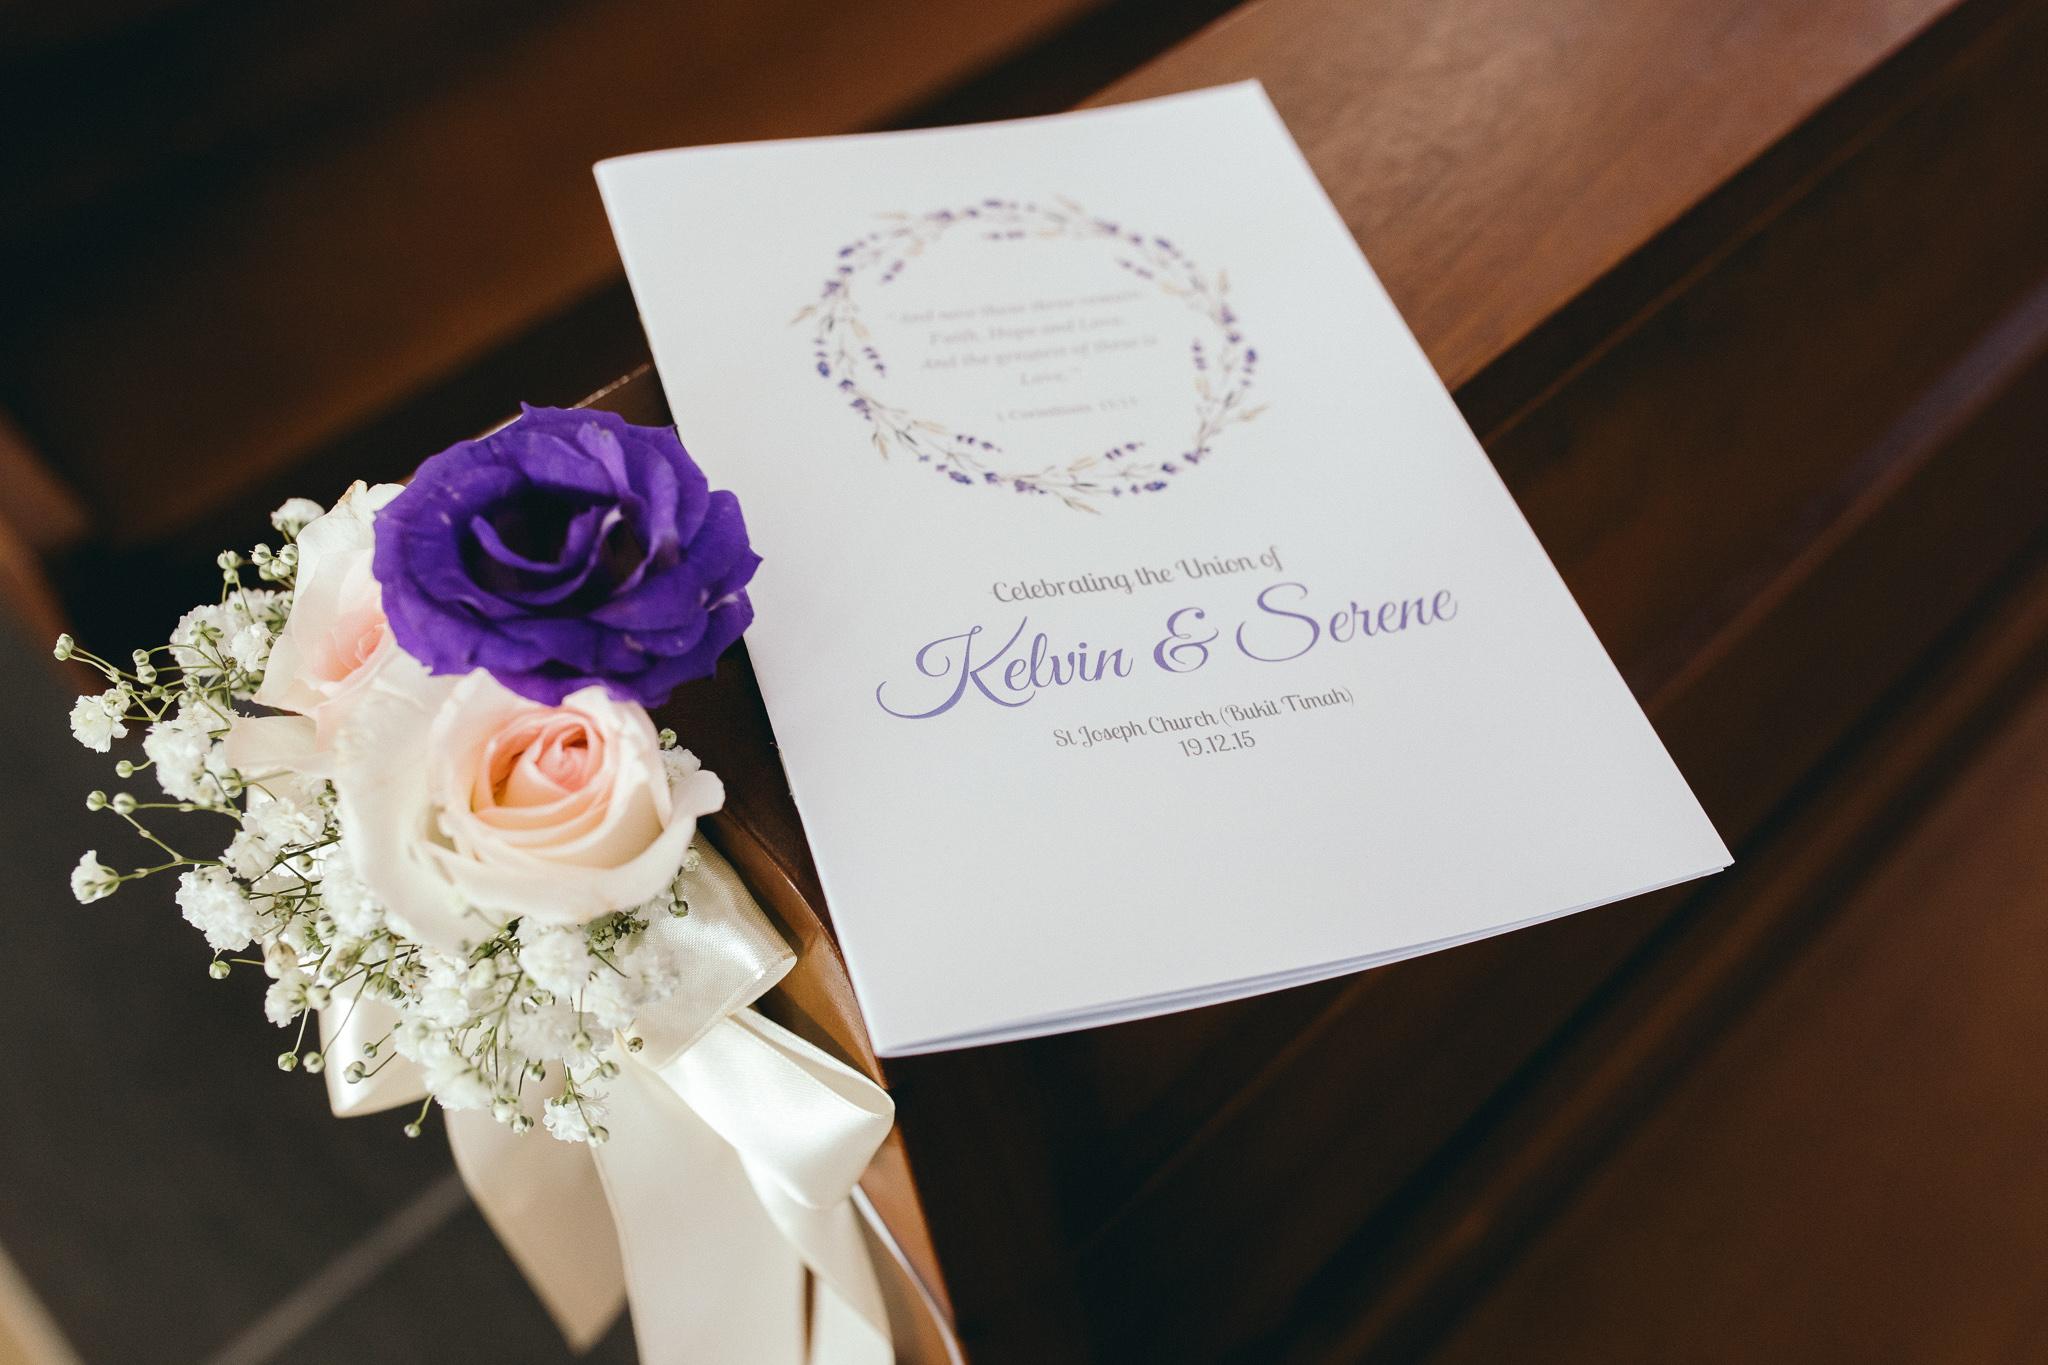 Juxtapose Pix - Wedding - Kelvin & Serene - church regent hotel 00021.jpg